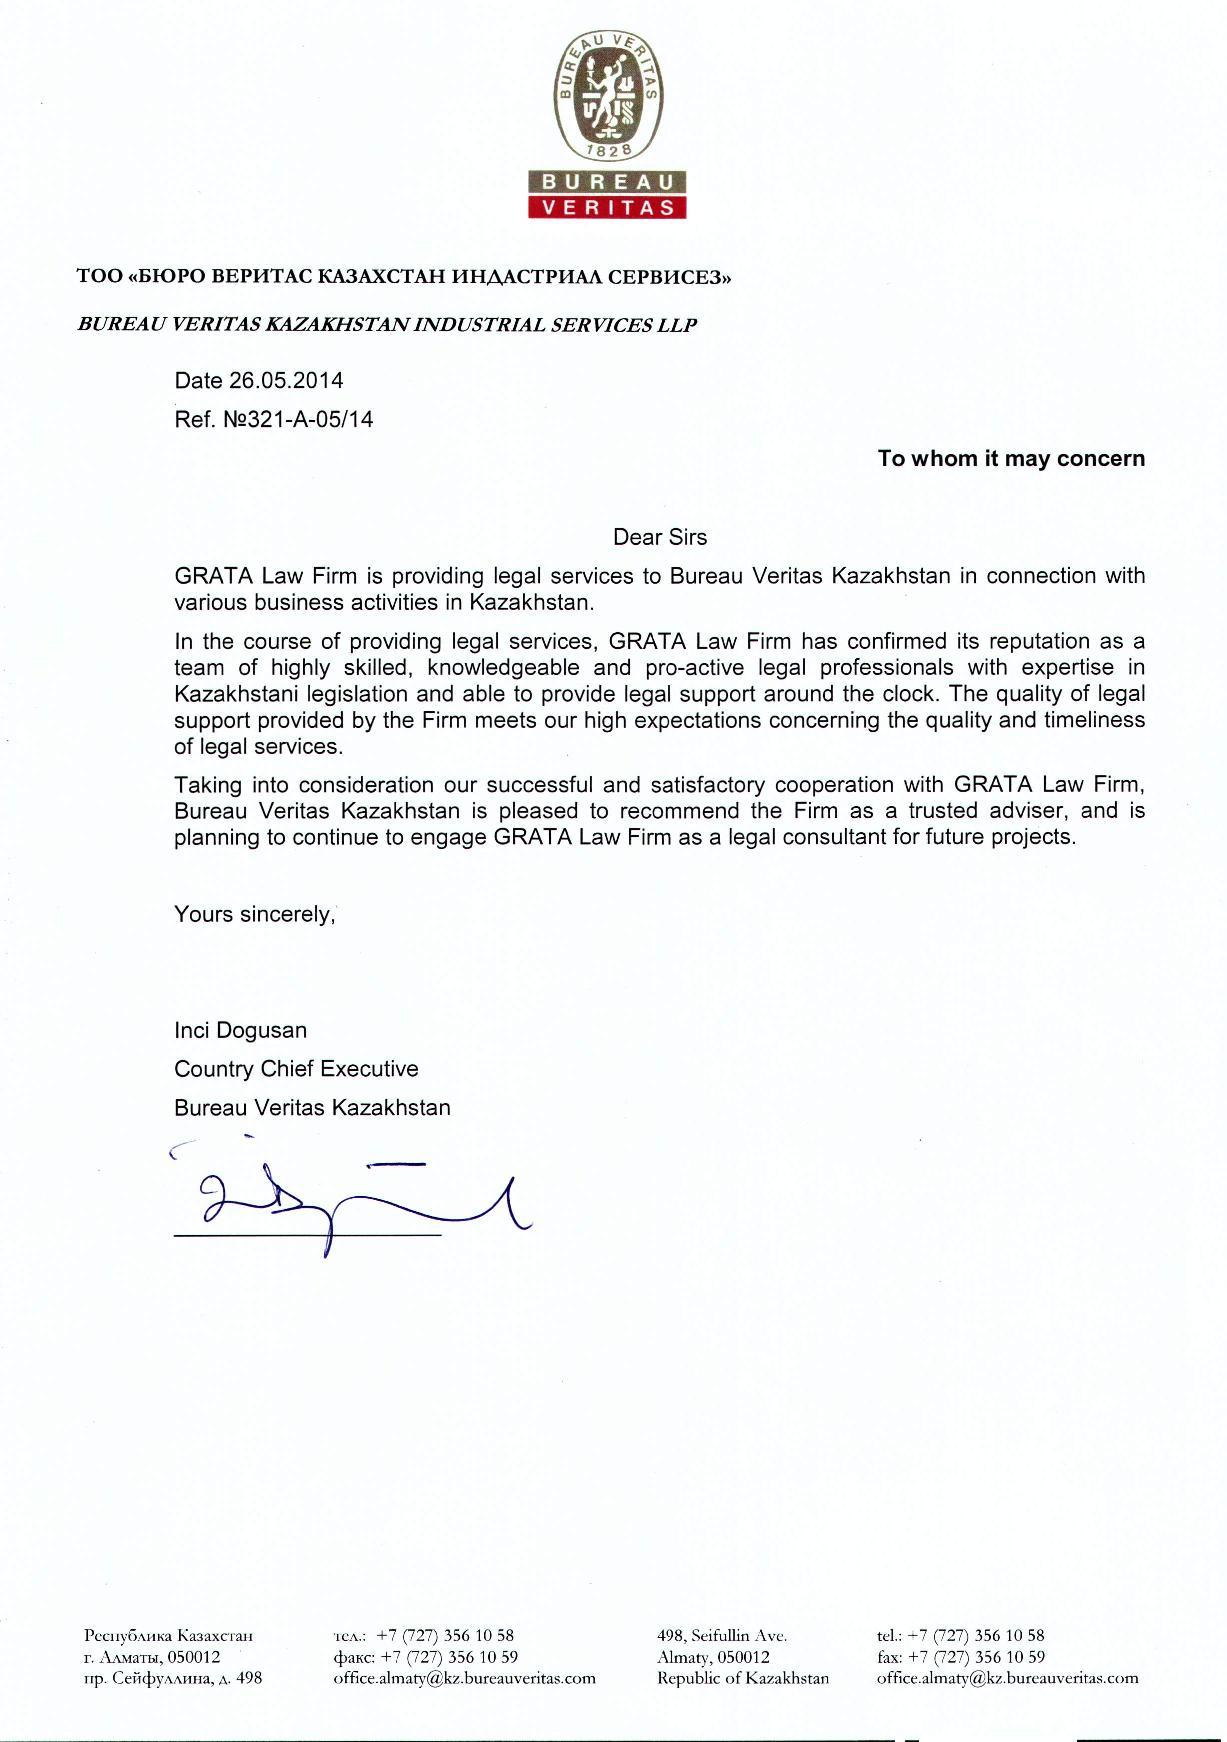 Grata international - Bureau veritas industrial services ...